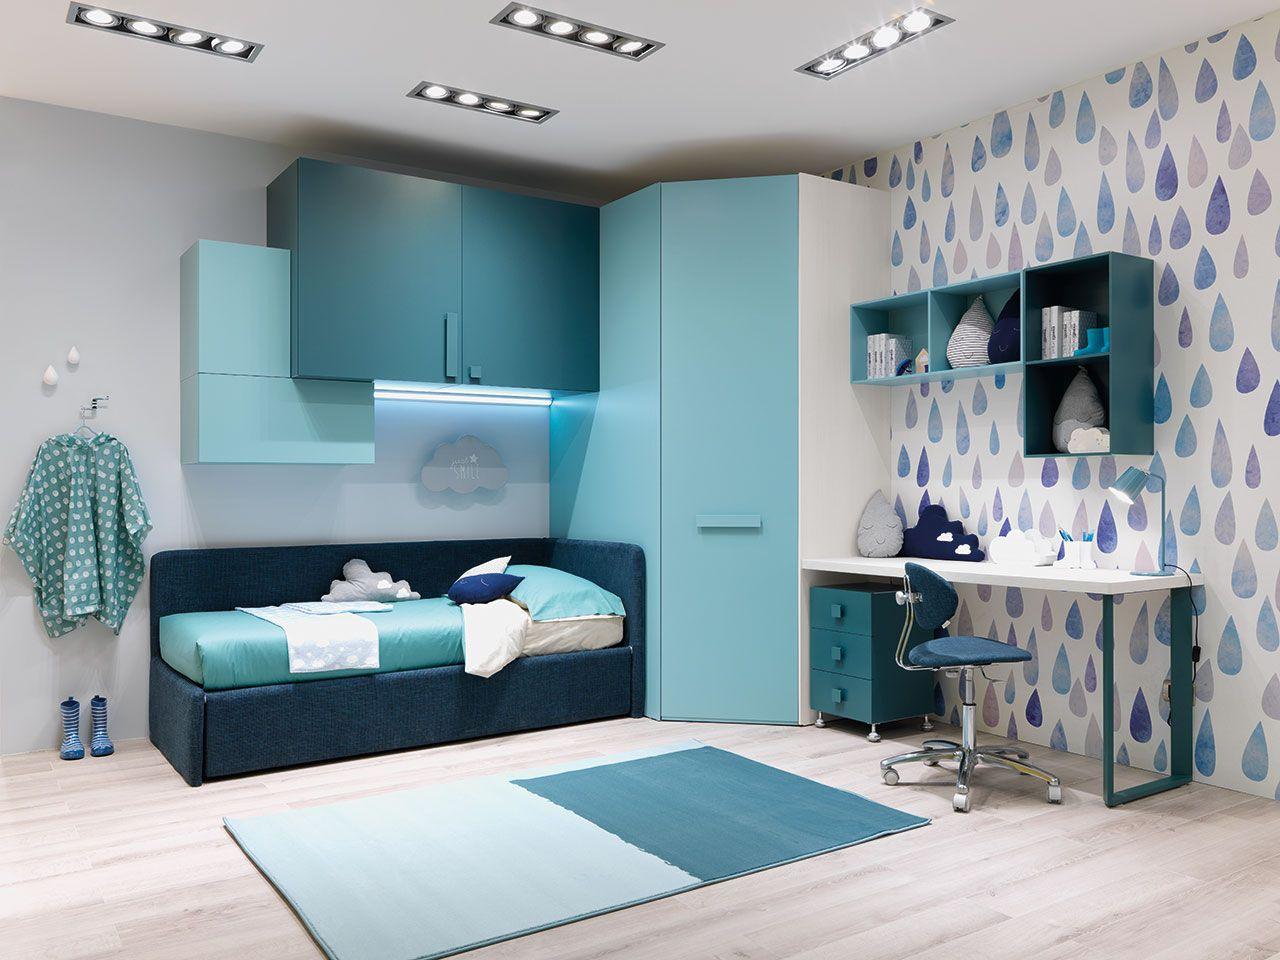 MorettiCompact - Camerette Moretti Compact | дизайн дома | Kids ...